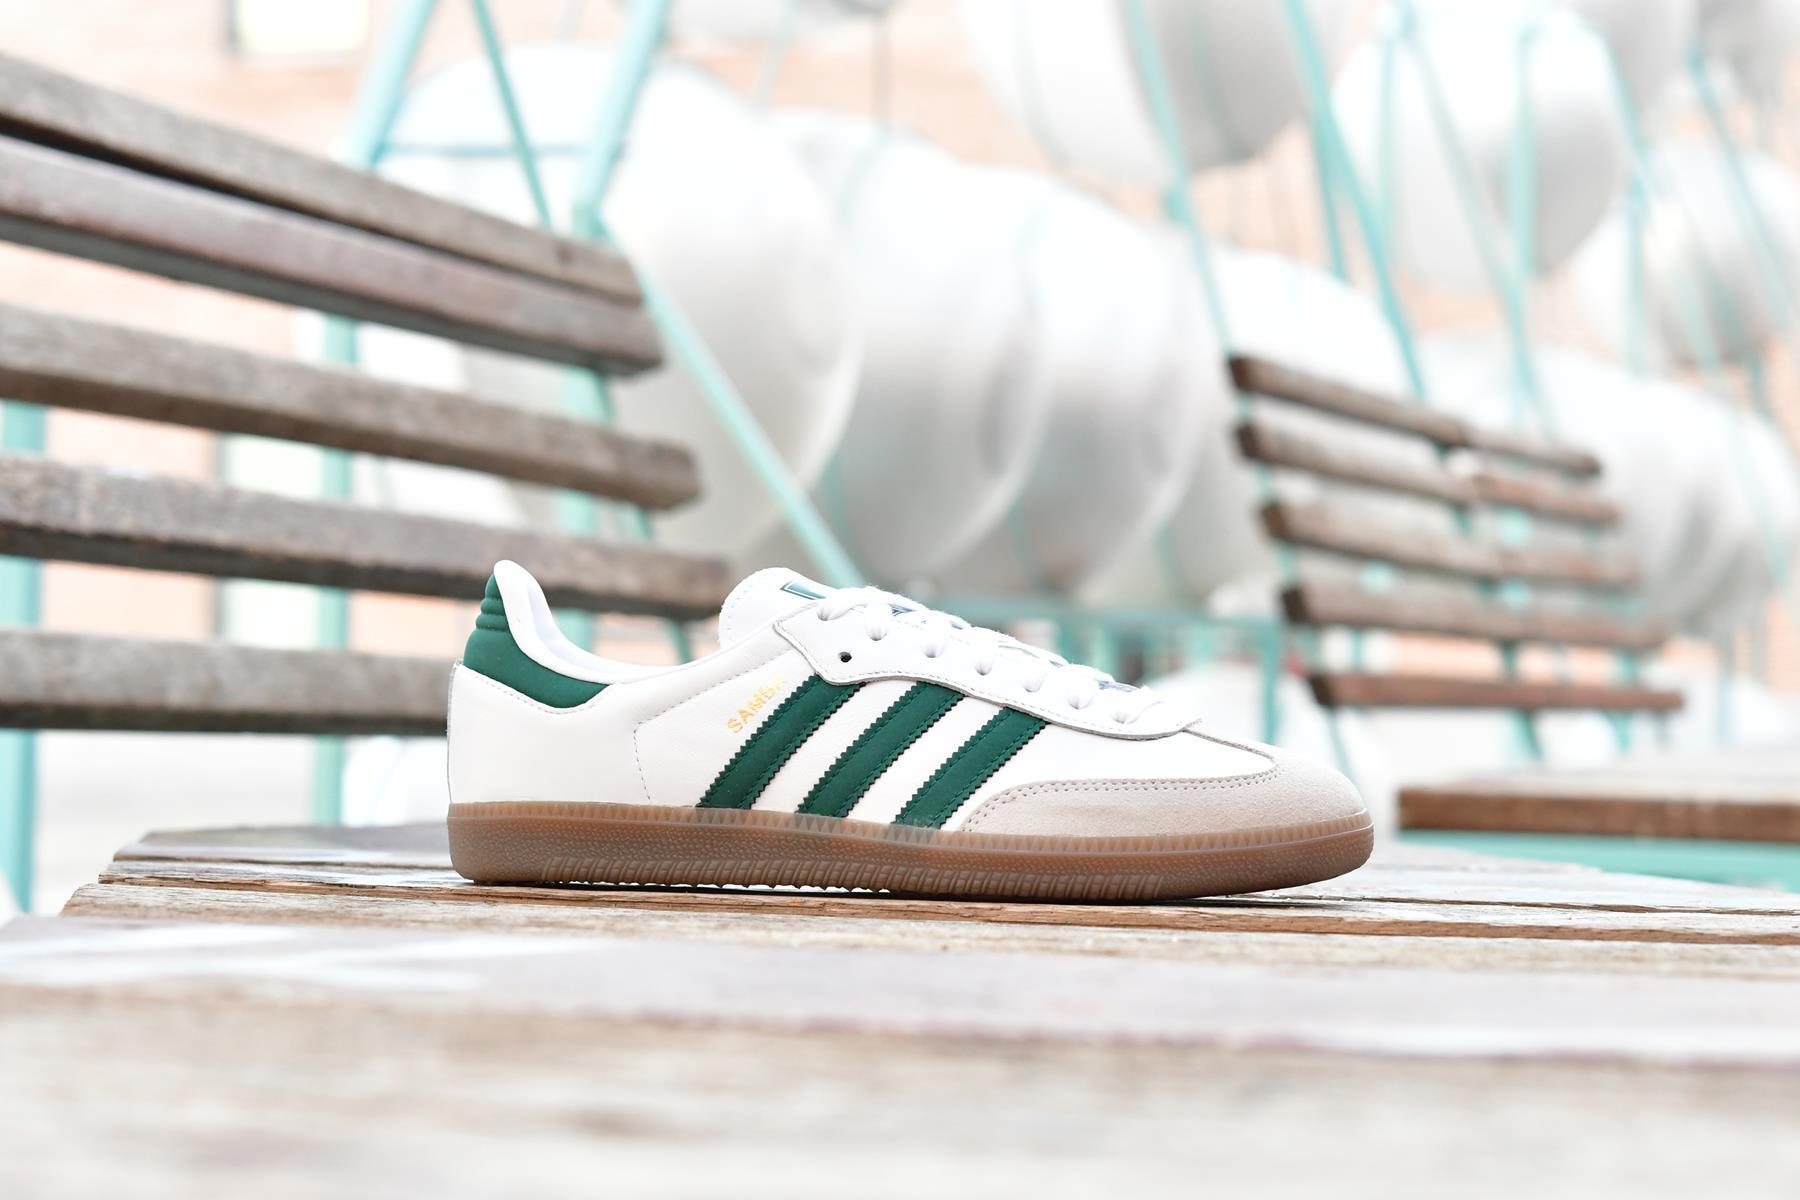 adidas blancas con rayas verdes